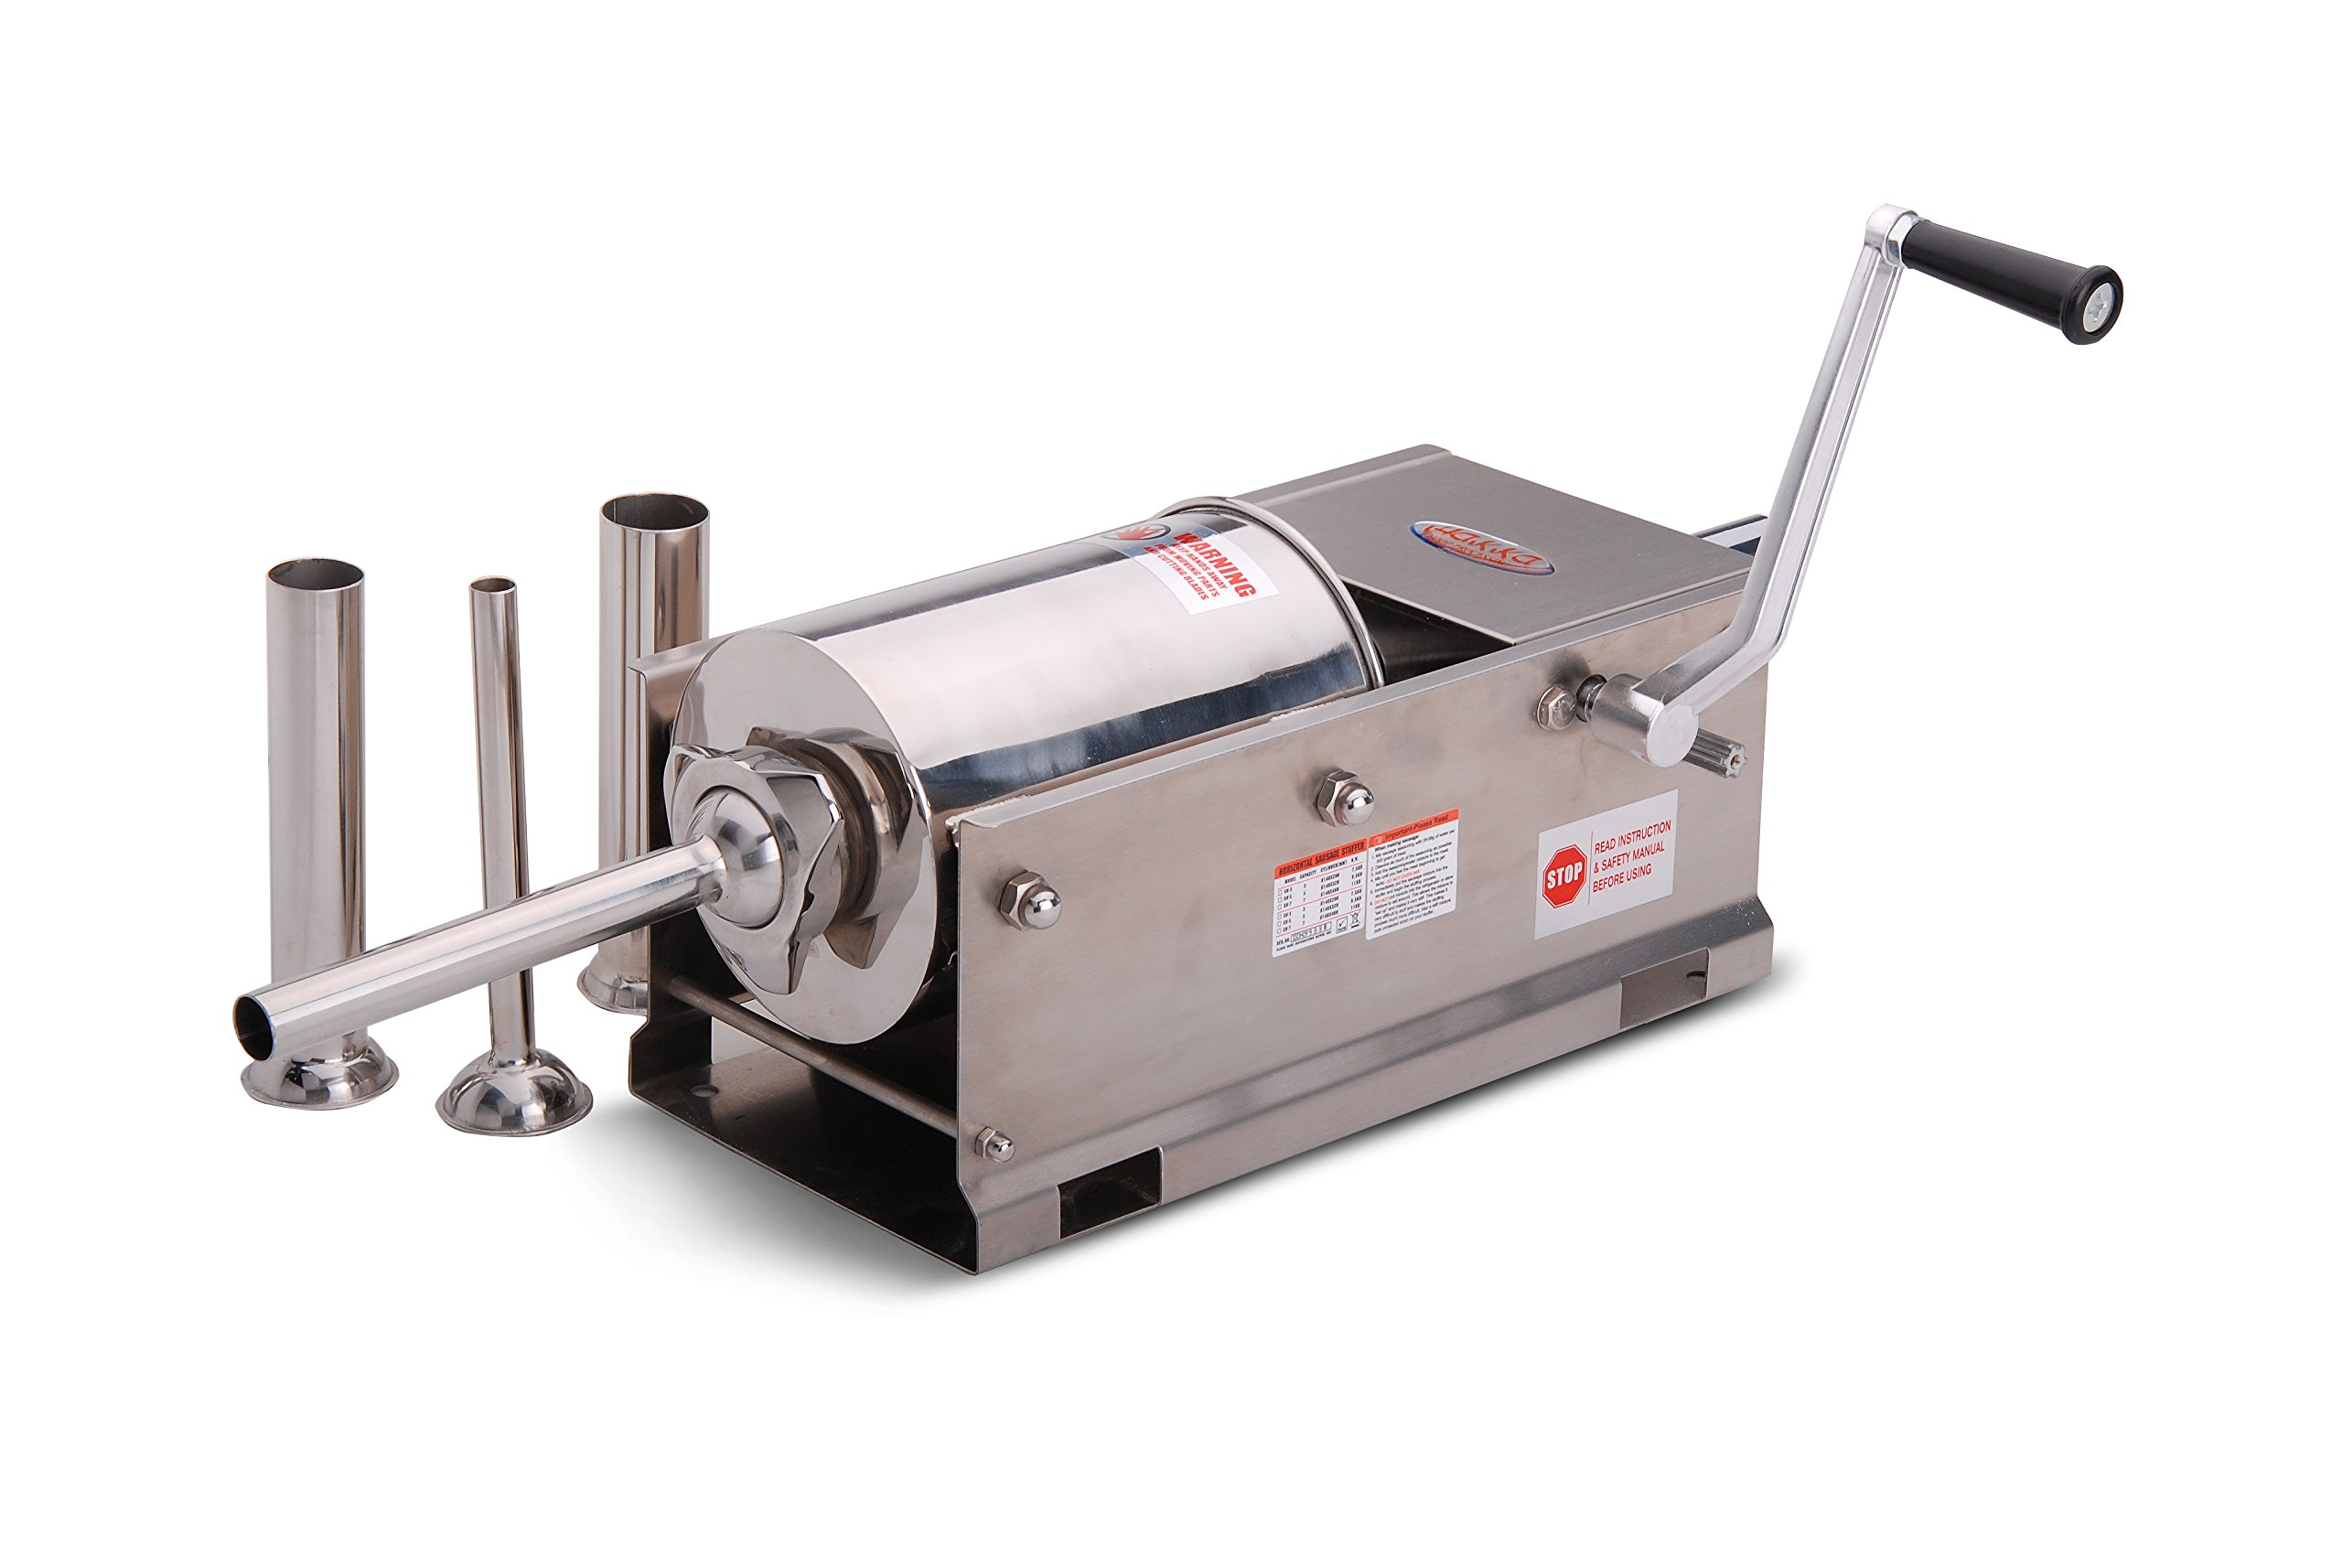 Hakka Sausage Stuffer 2 Speed Stainless Steel Vertical Sausage Maker (7Lb/3L(Horizontal)) by HAKKA BROTHERS